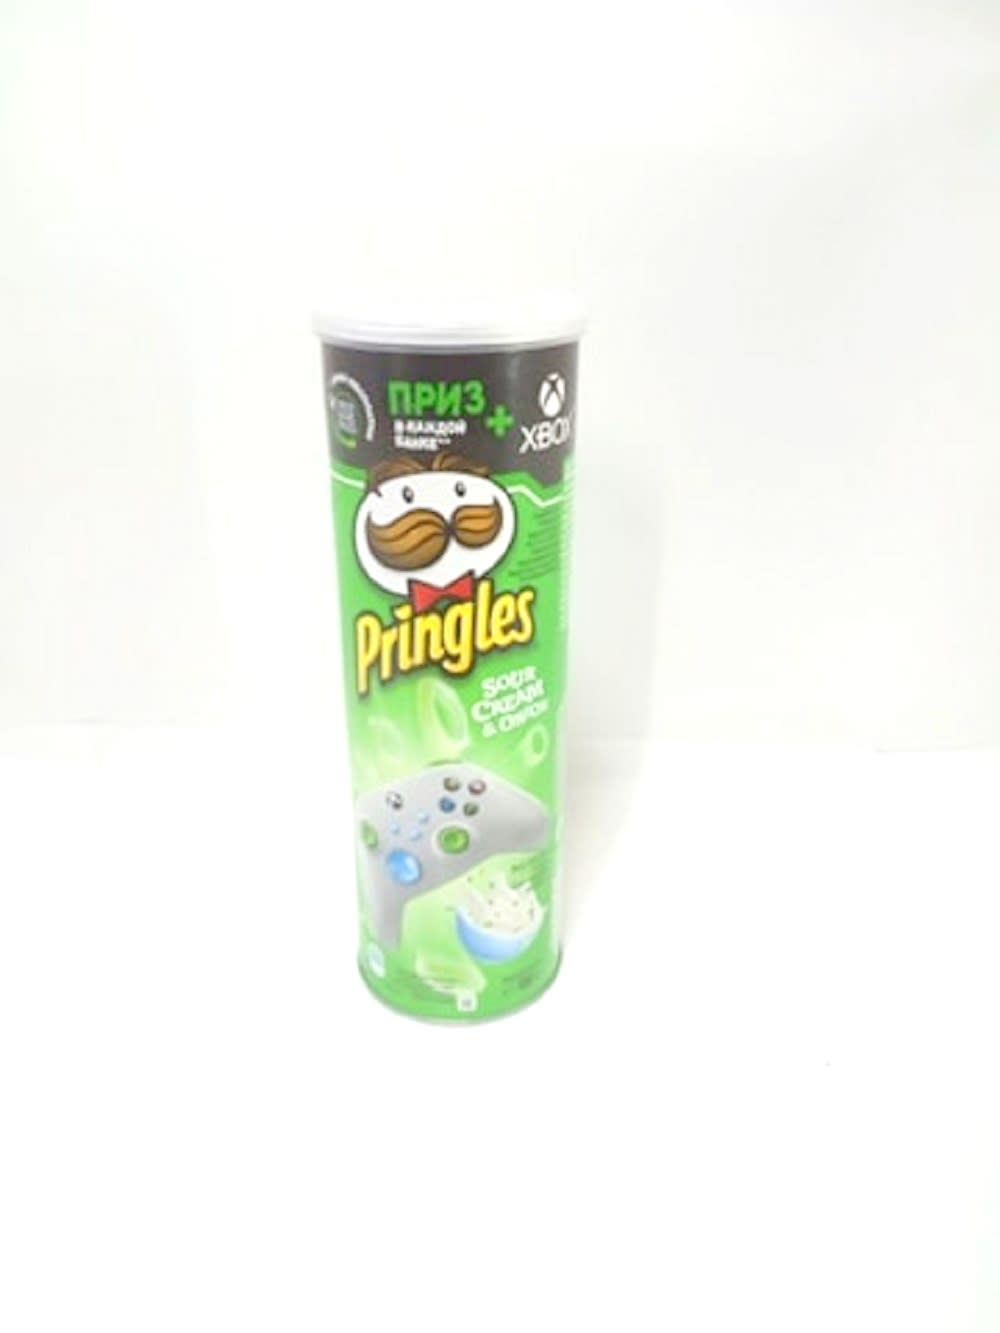 Pringles 165 გრ ნაღებით და ხახვით